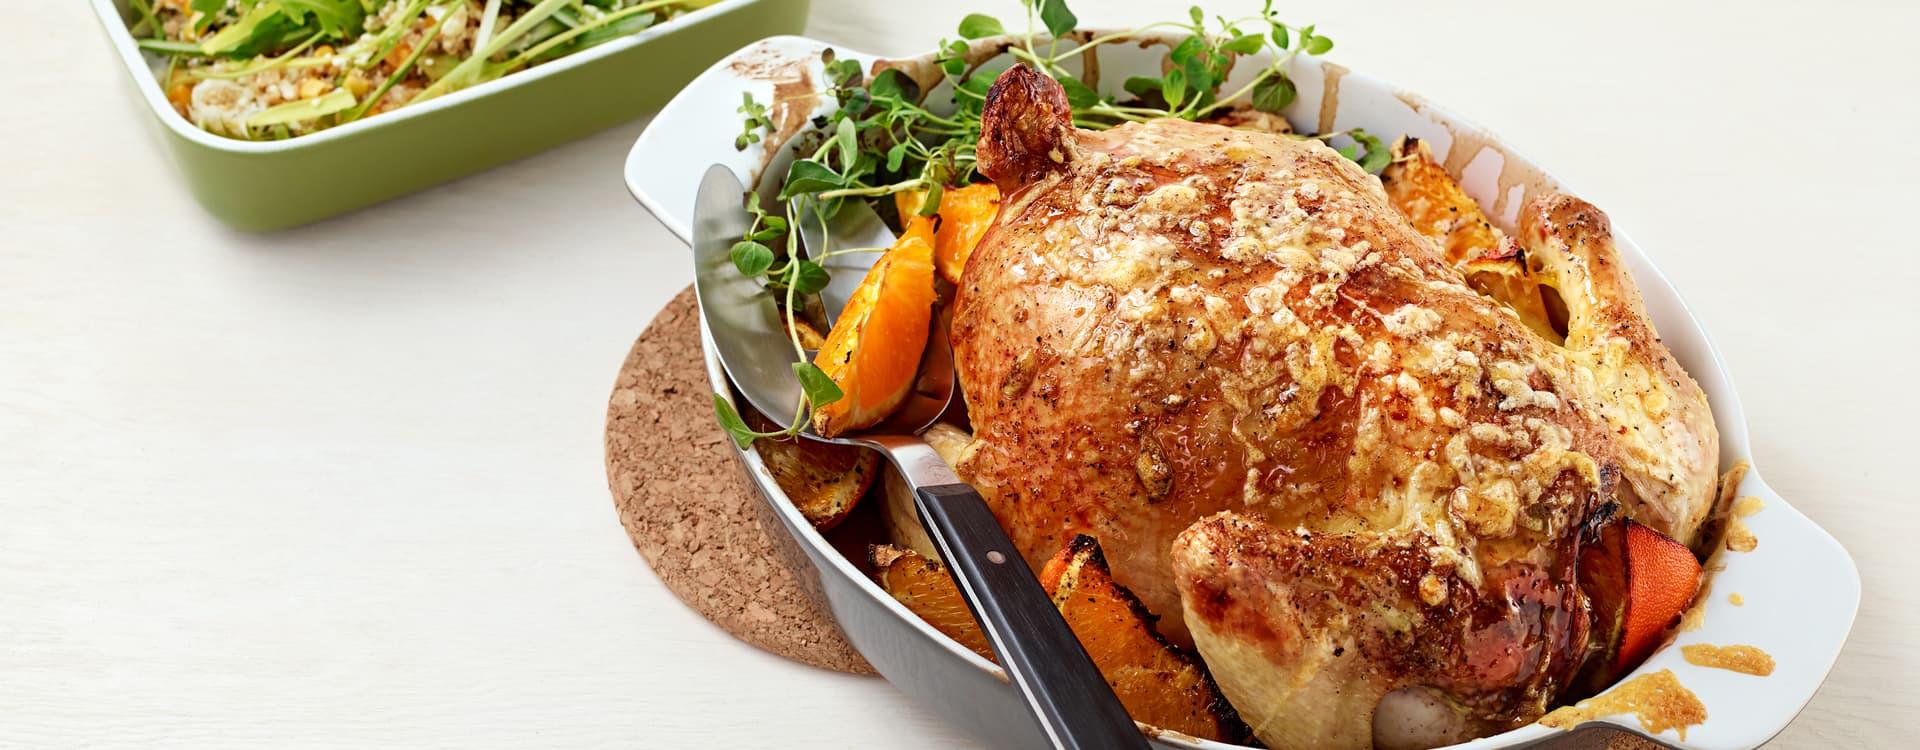 Hel kylling med appelsin og quinoasalat med mais og blomkål